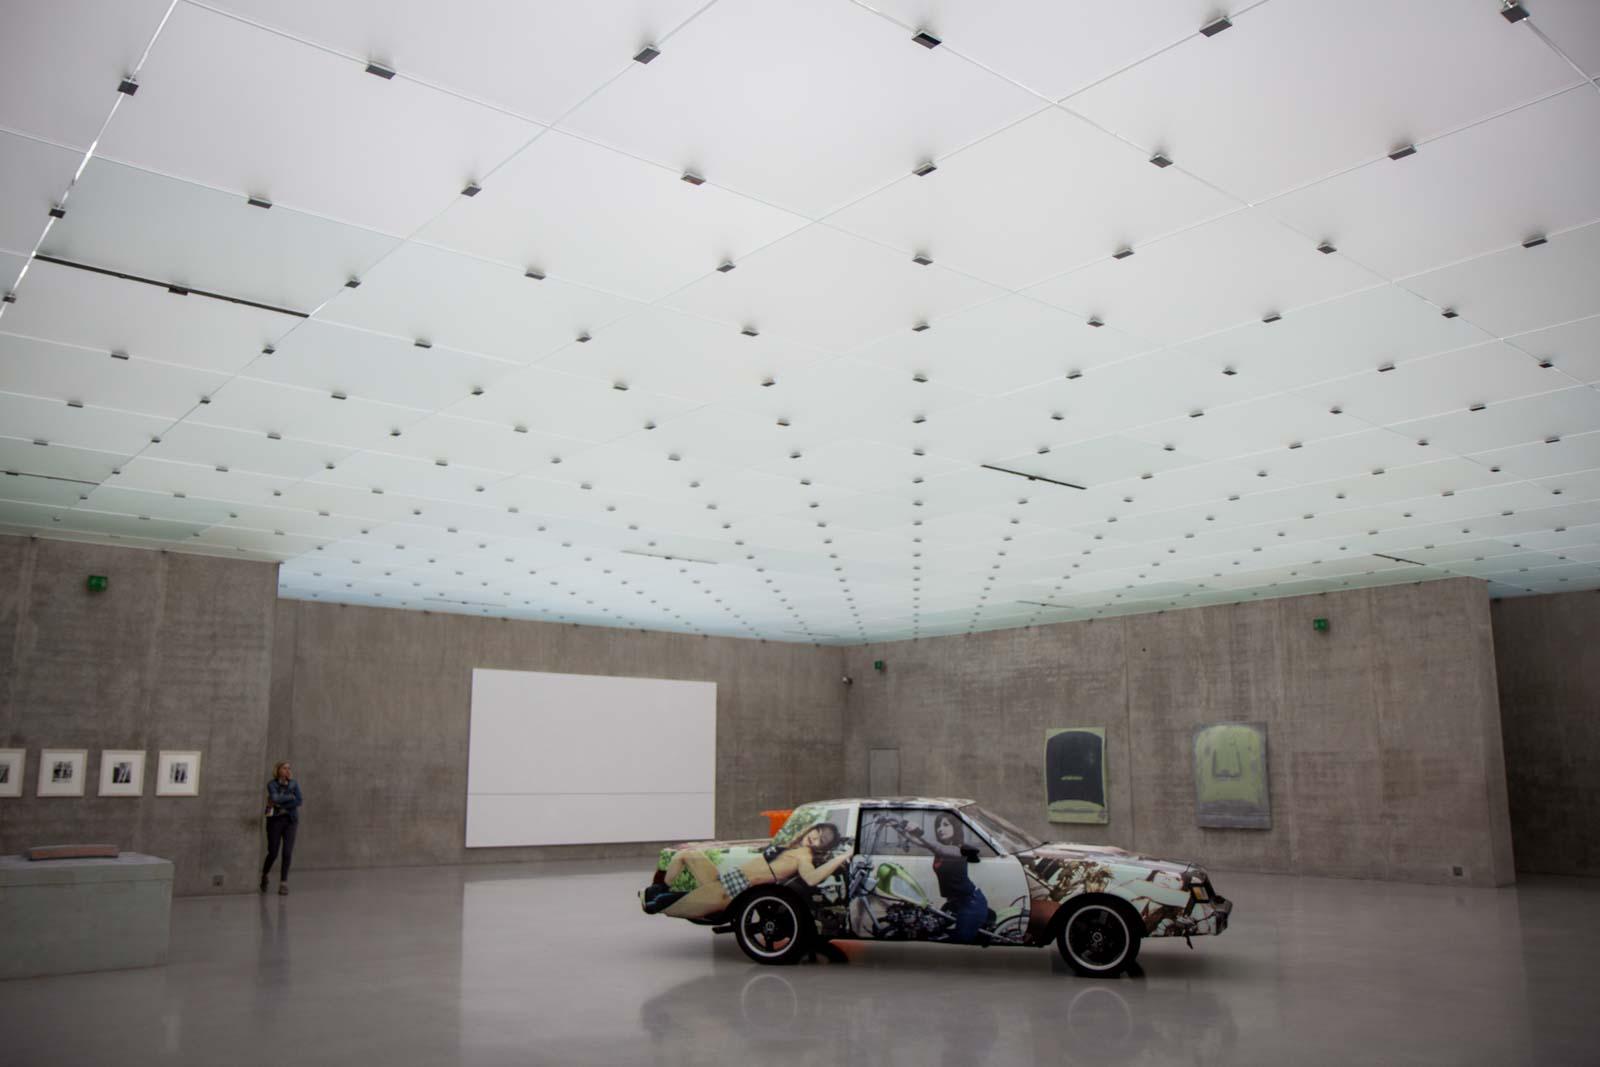 Kunsthaus Bregenz, modern art gallery, Austria